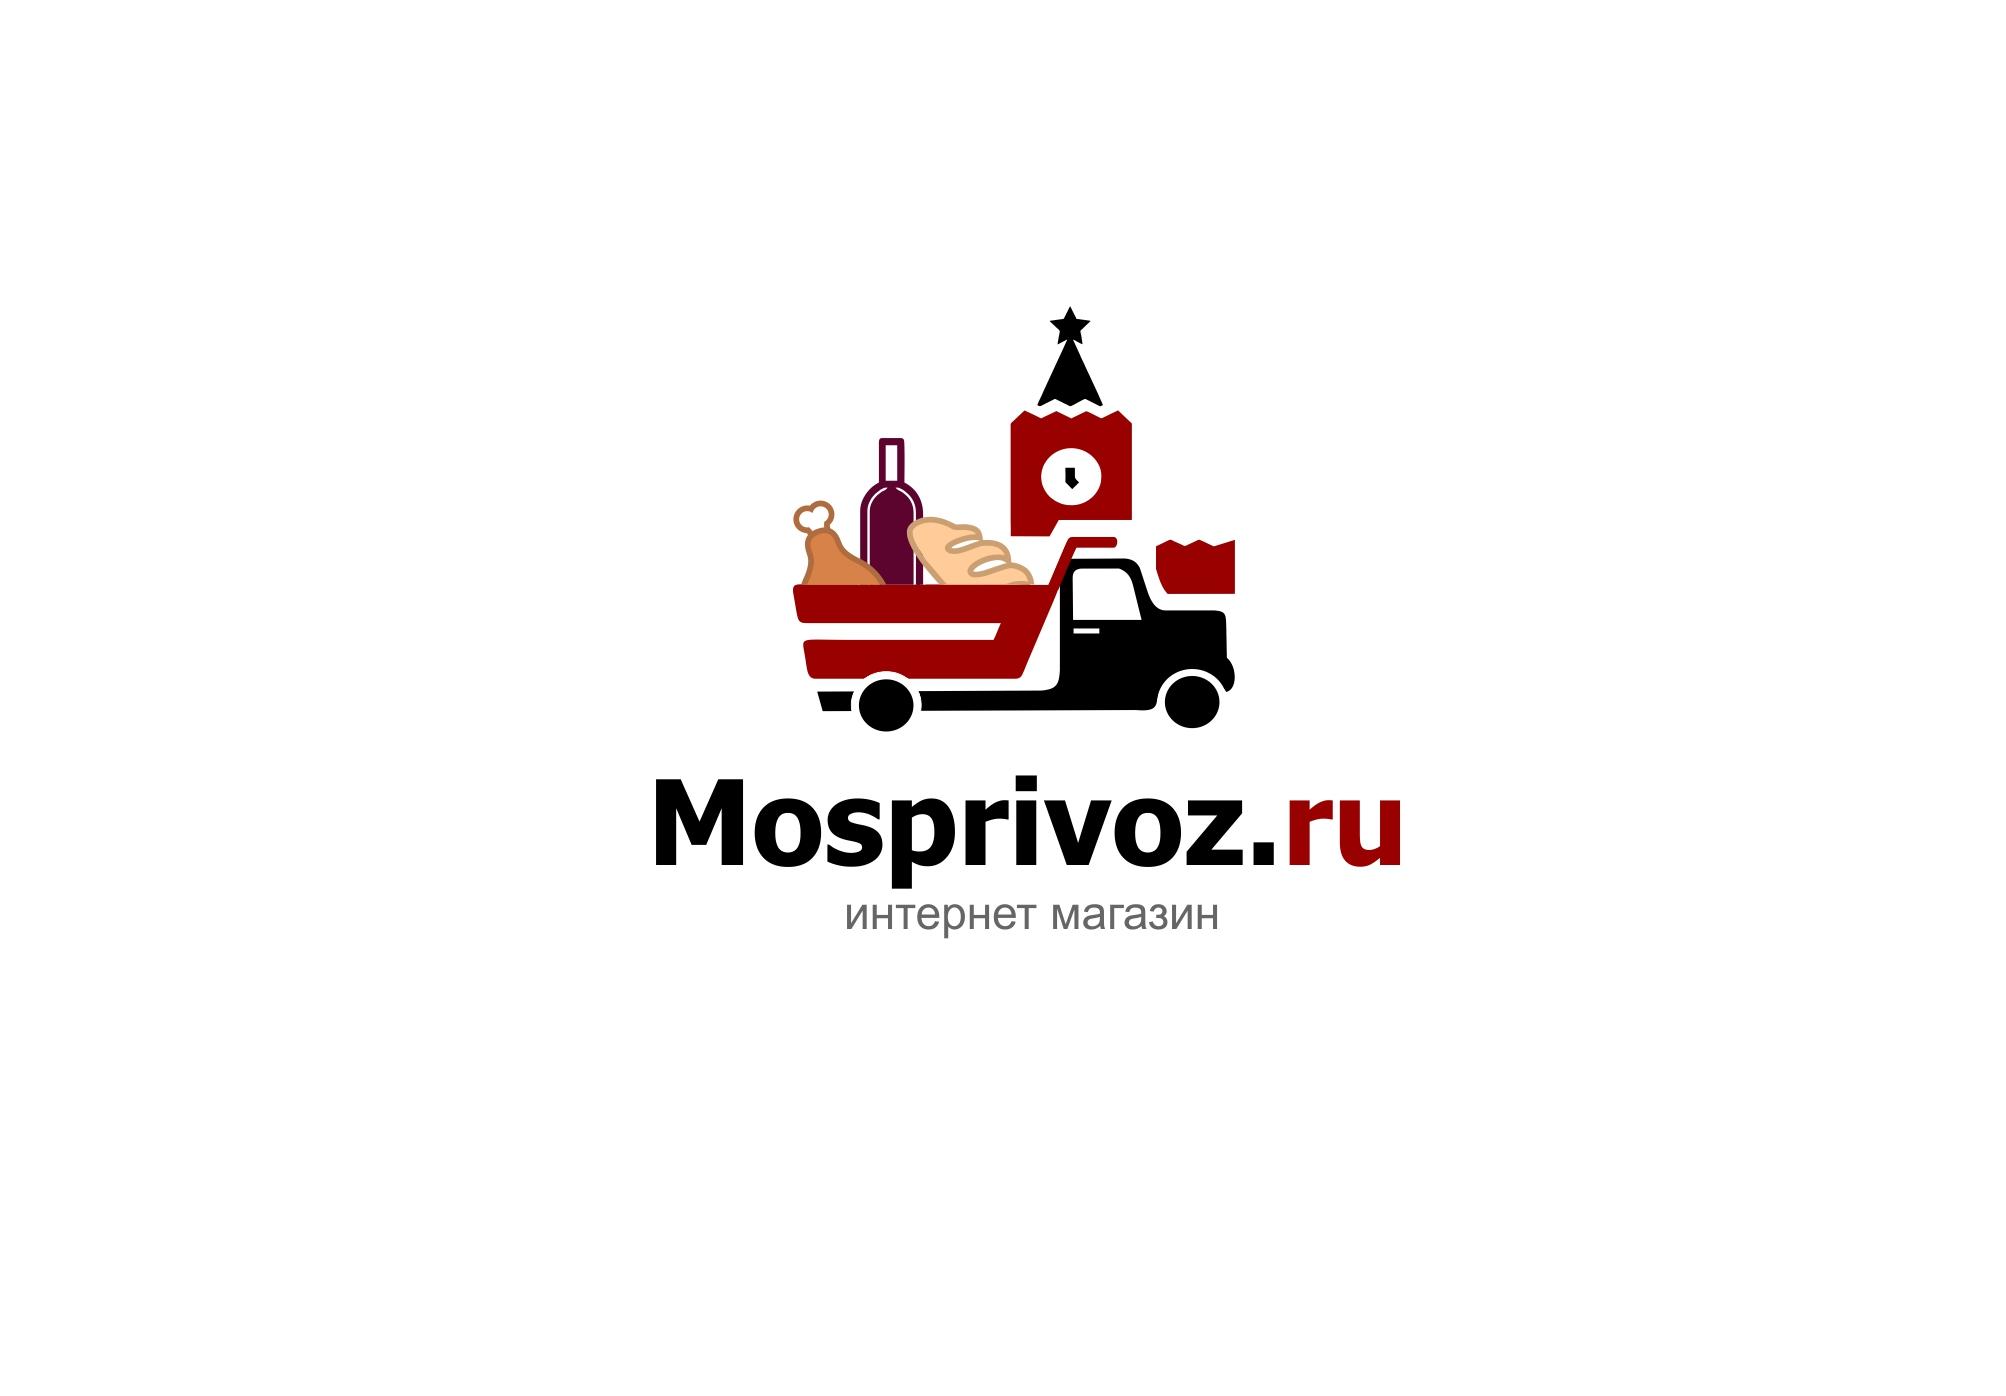 Логотип. Интернет - магазин по доставке продуктов питания. фото f_5785ad878bfc4594.jpg